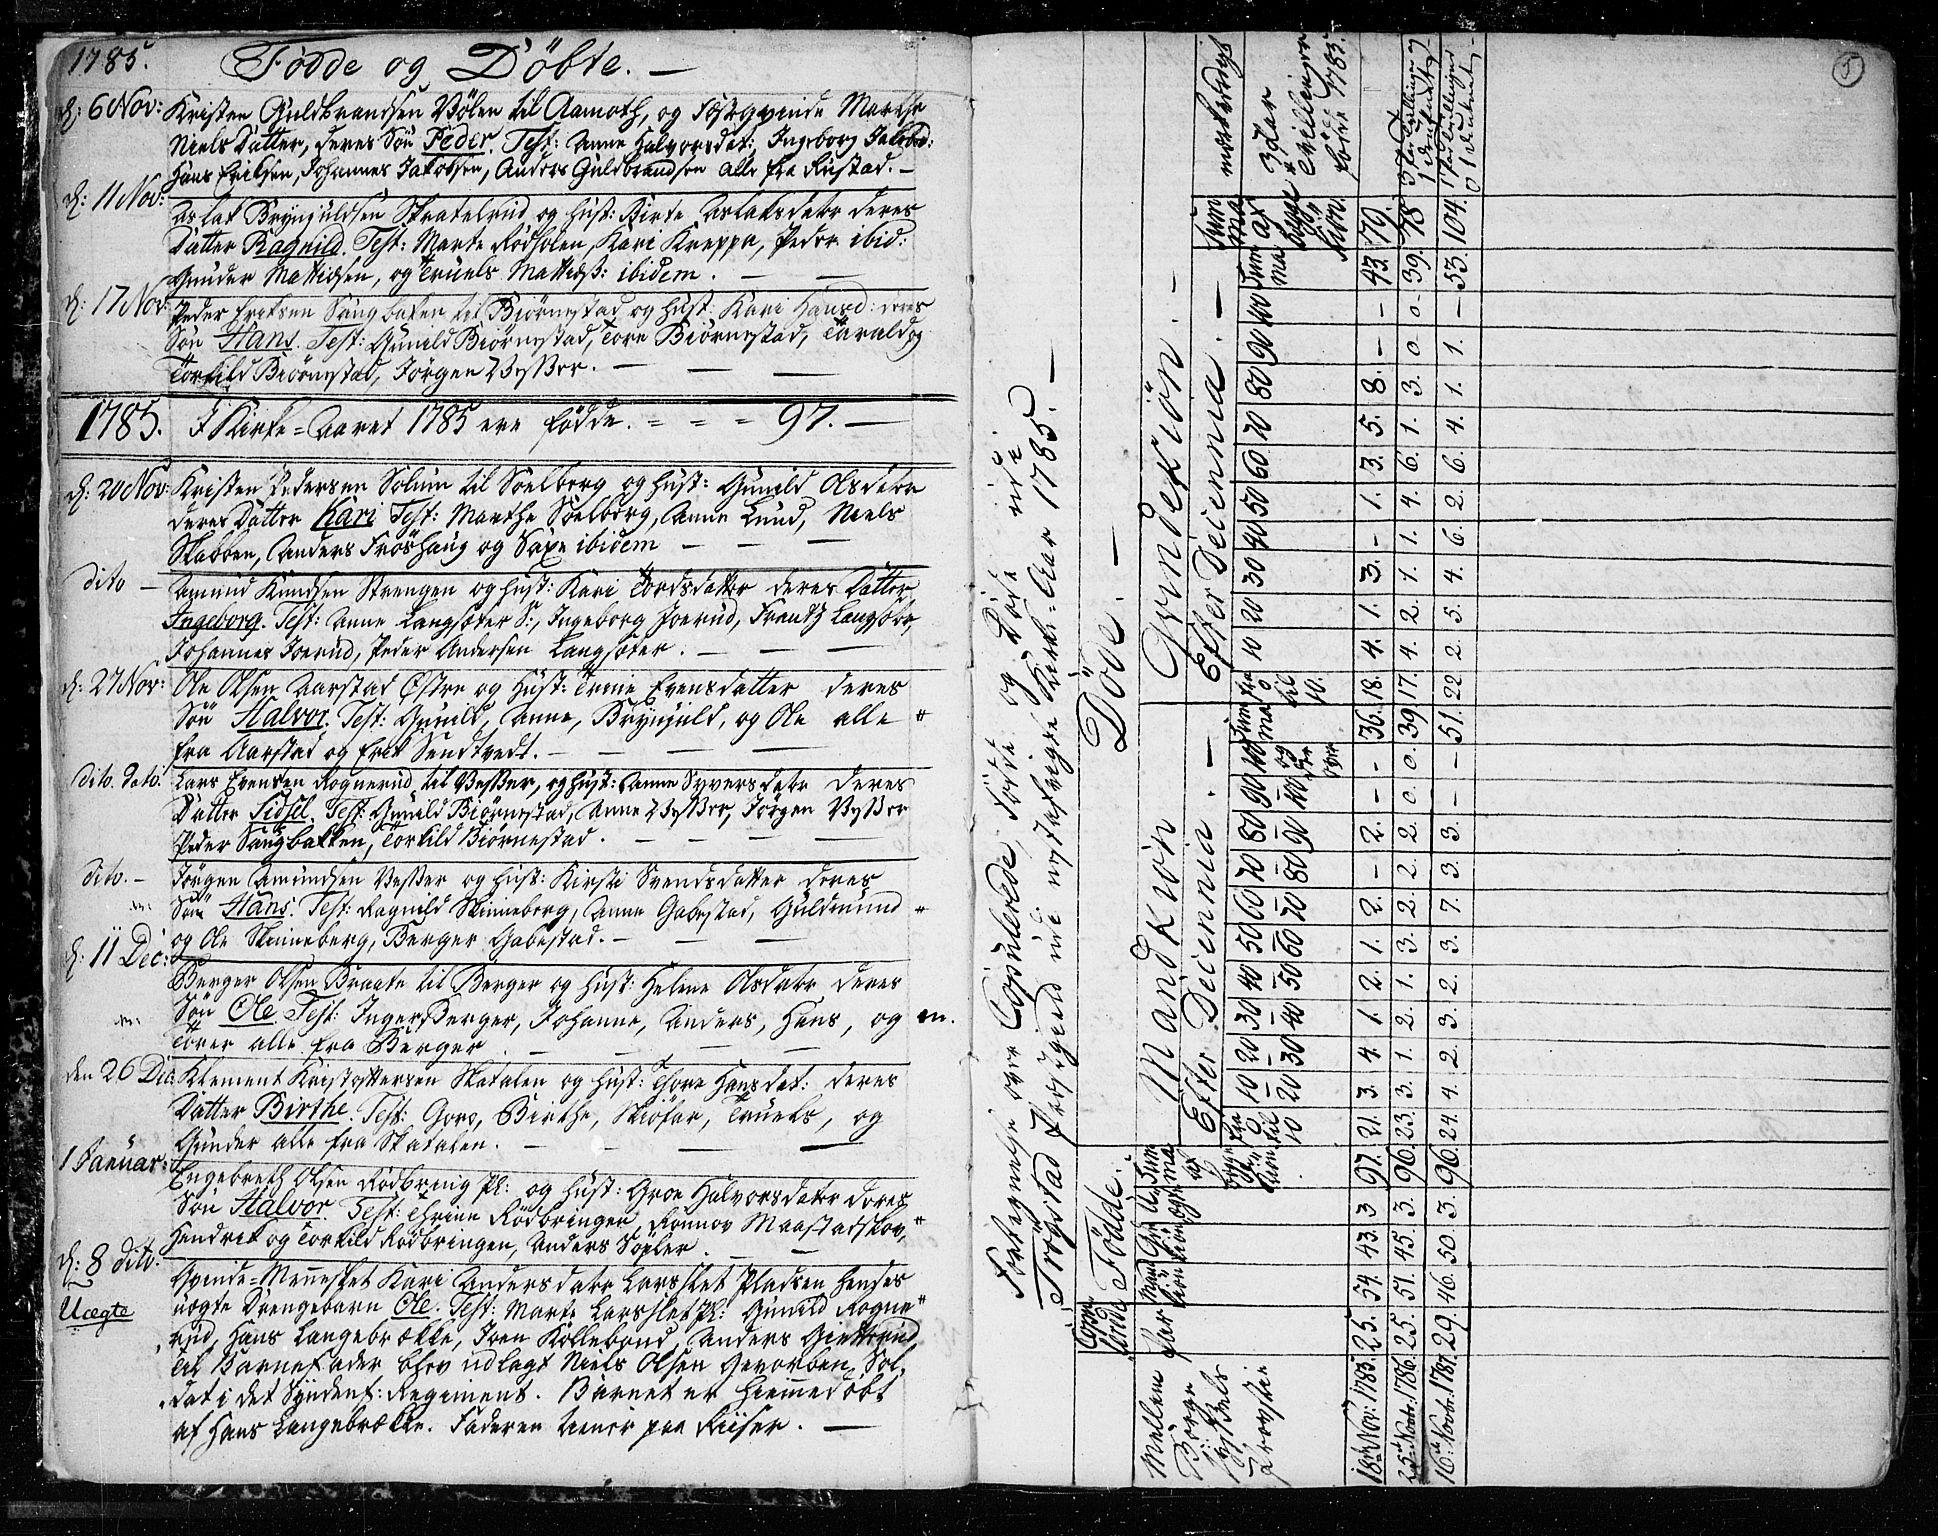 SAO, Trøgstad prestekontor Kirkebøker, F/Fa/L0005: Ministerialbok nr. I 5, 1784-1814, s. 5